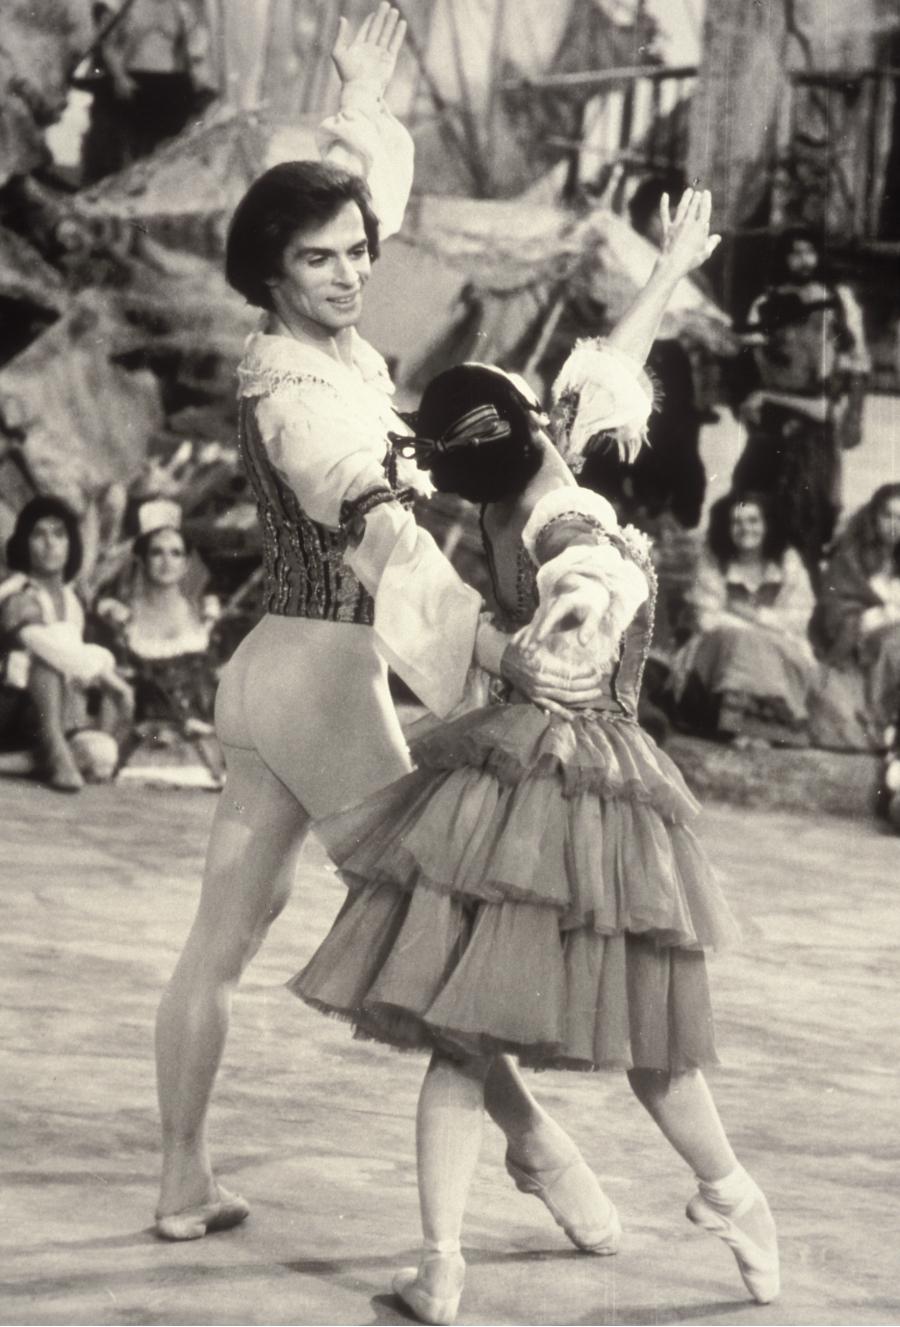 Rudolph Nuryev and Lucette Aldous in Don Quixote, 1973